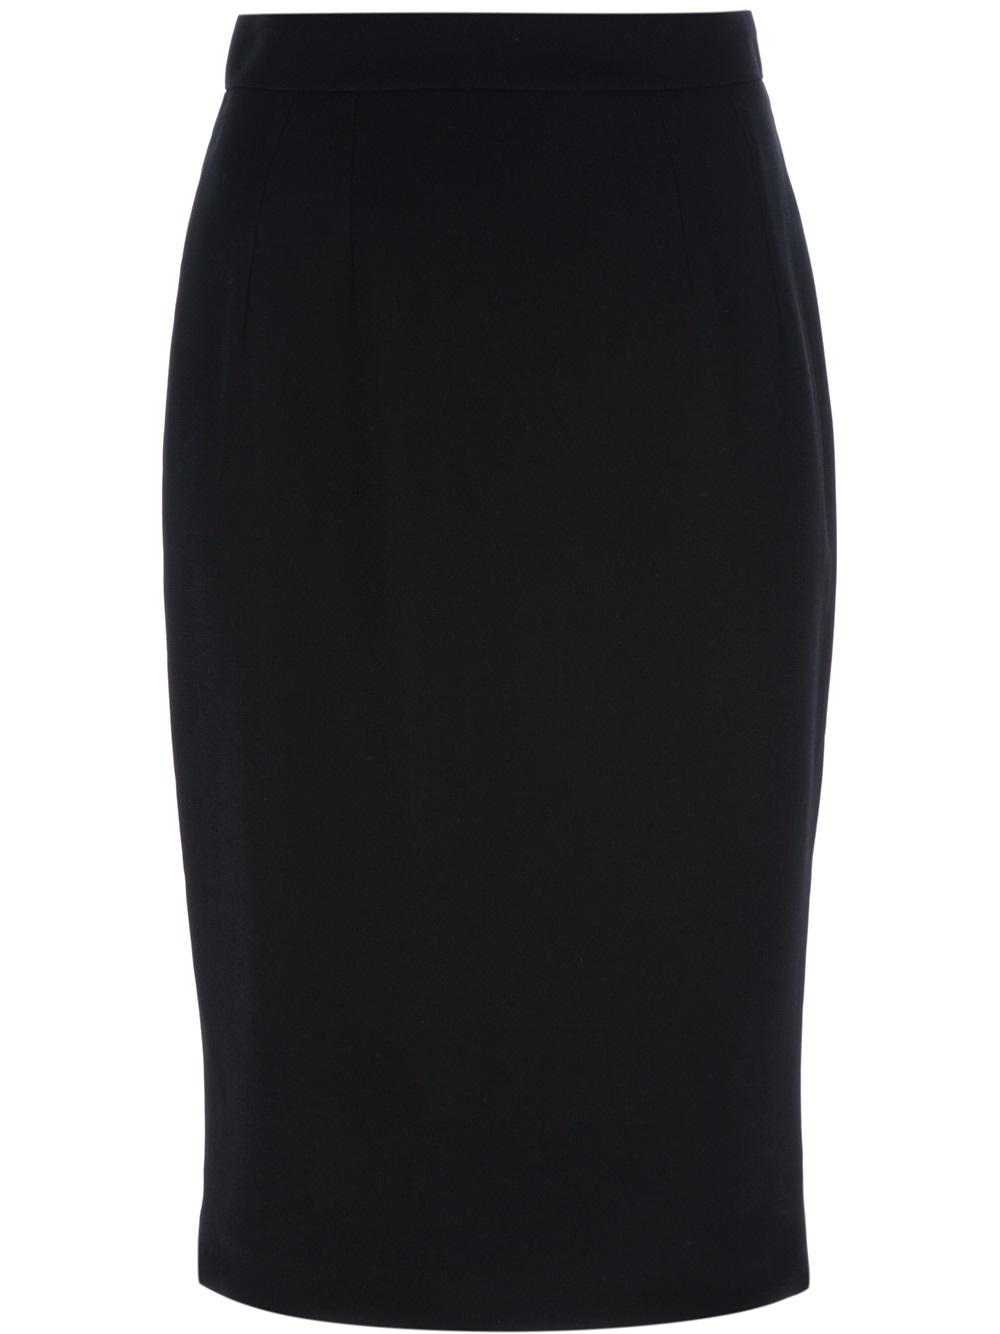 dolce gabbana knee length pencil skirt in black lyst